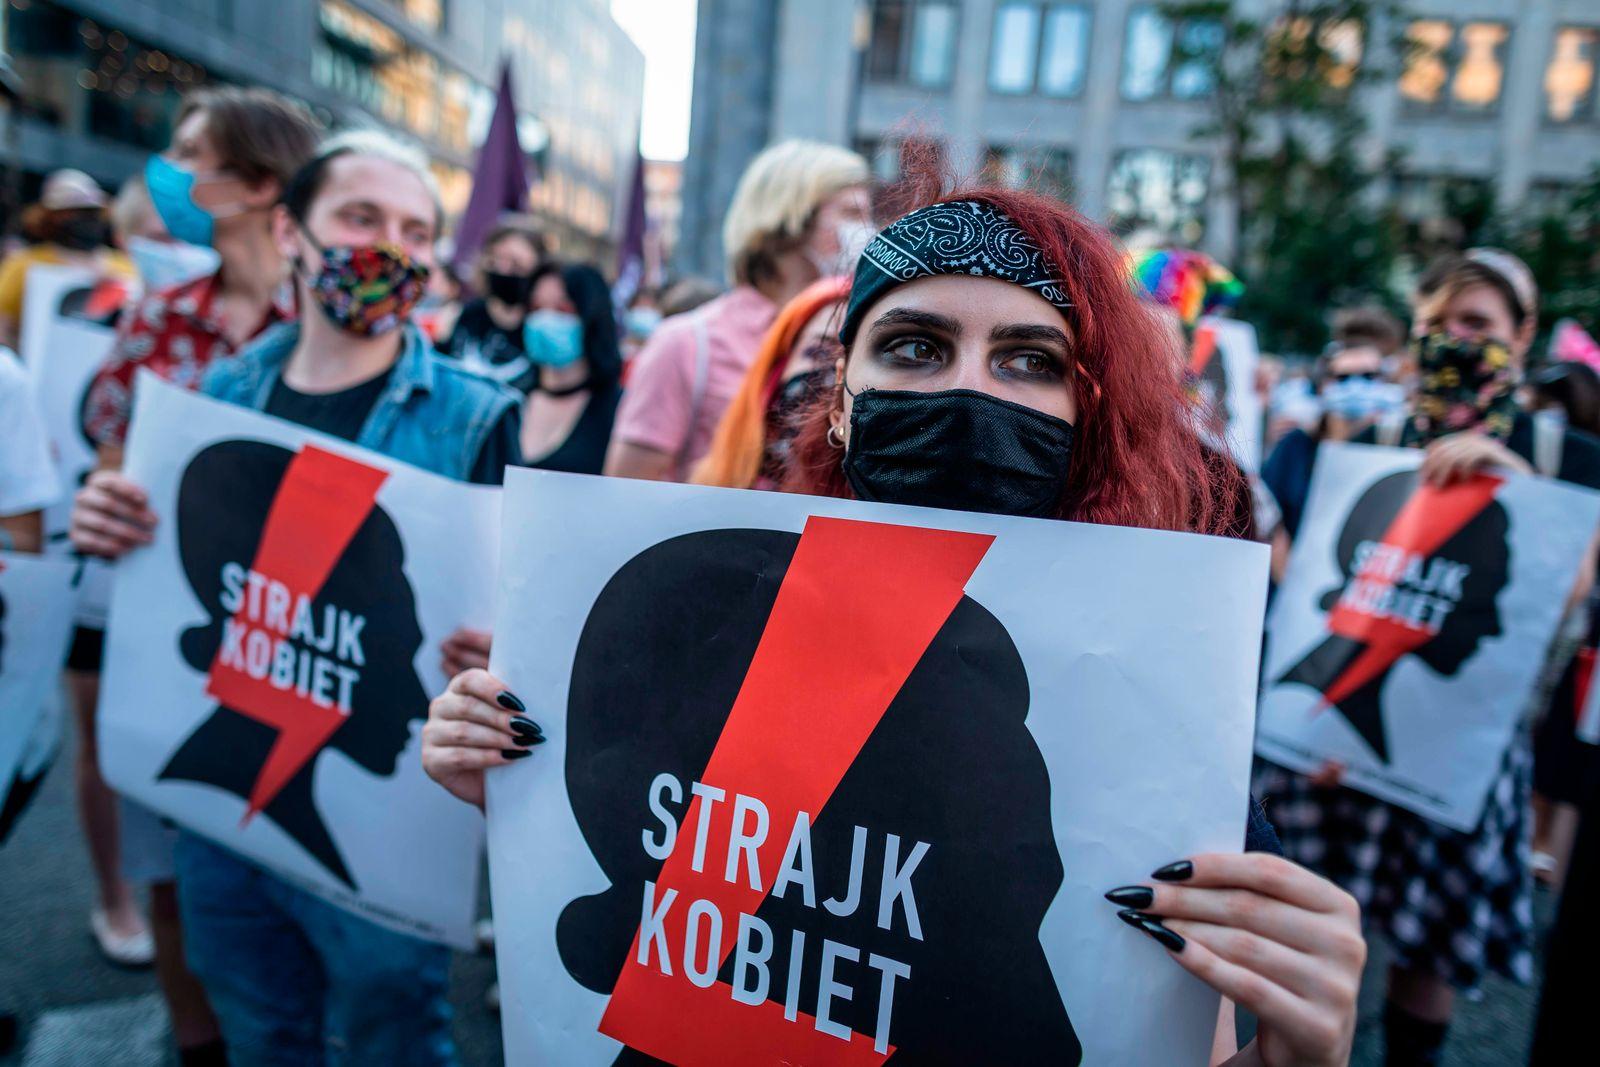 POLAND-POLITICS-WOMENS RIGHTS